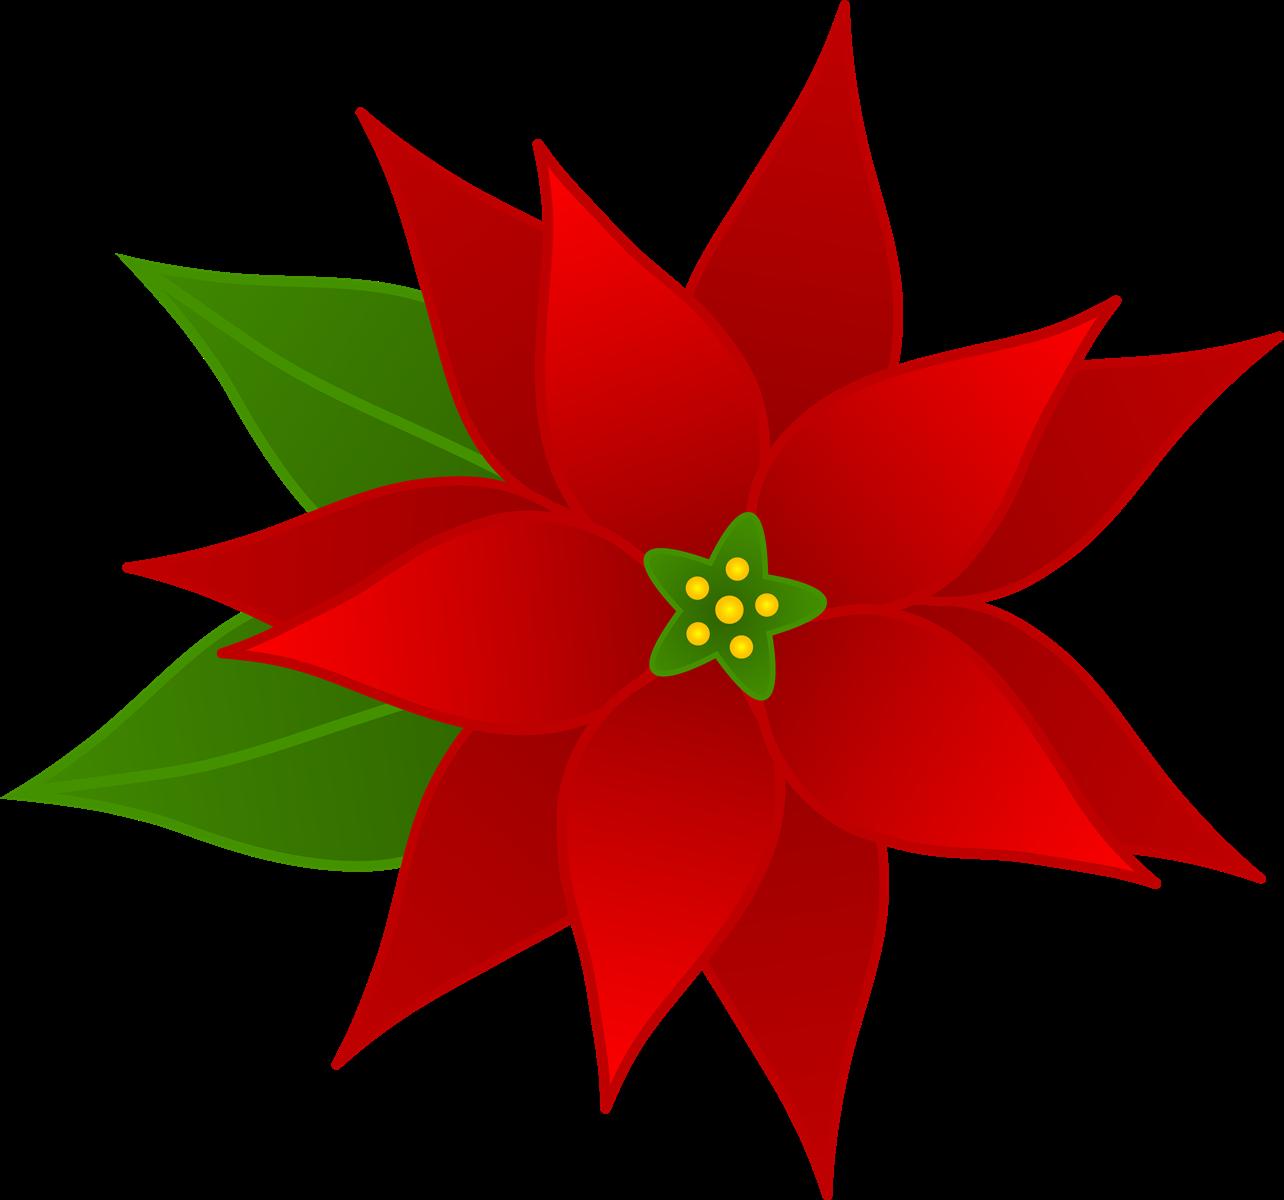 Flowers clip art many. Poinsettia clipart design